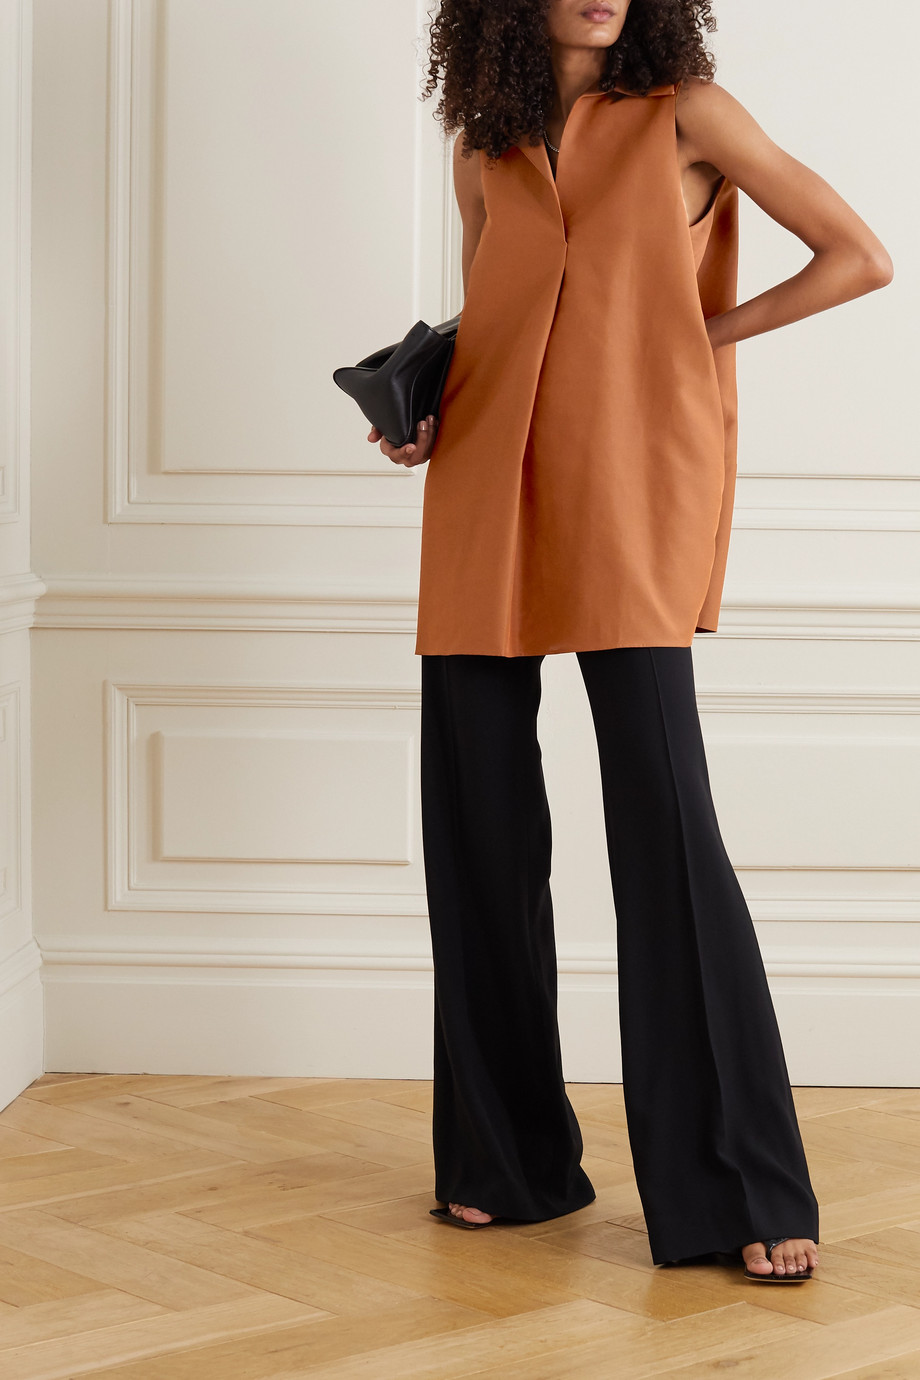 Co Woven blouse